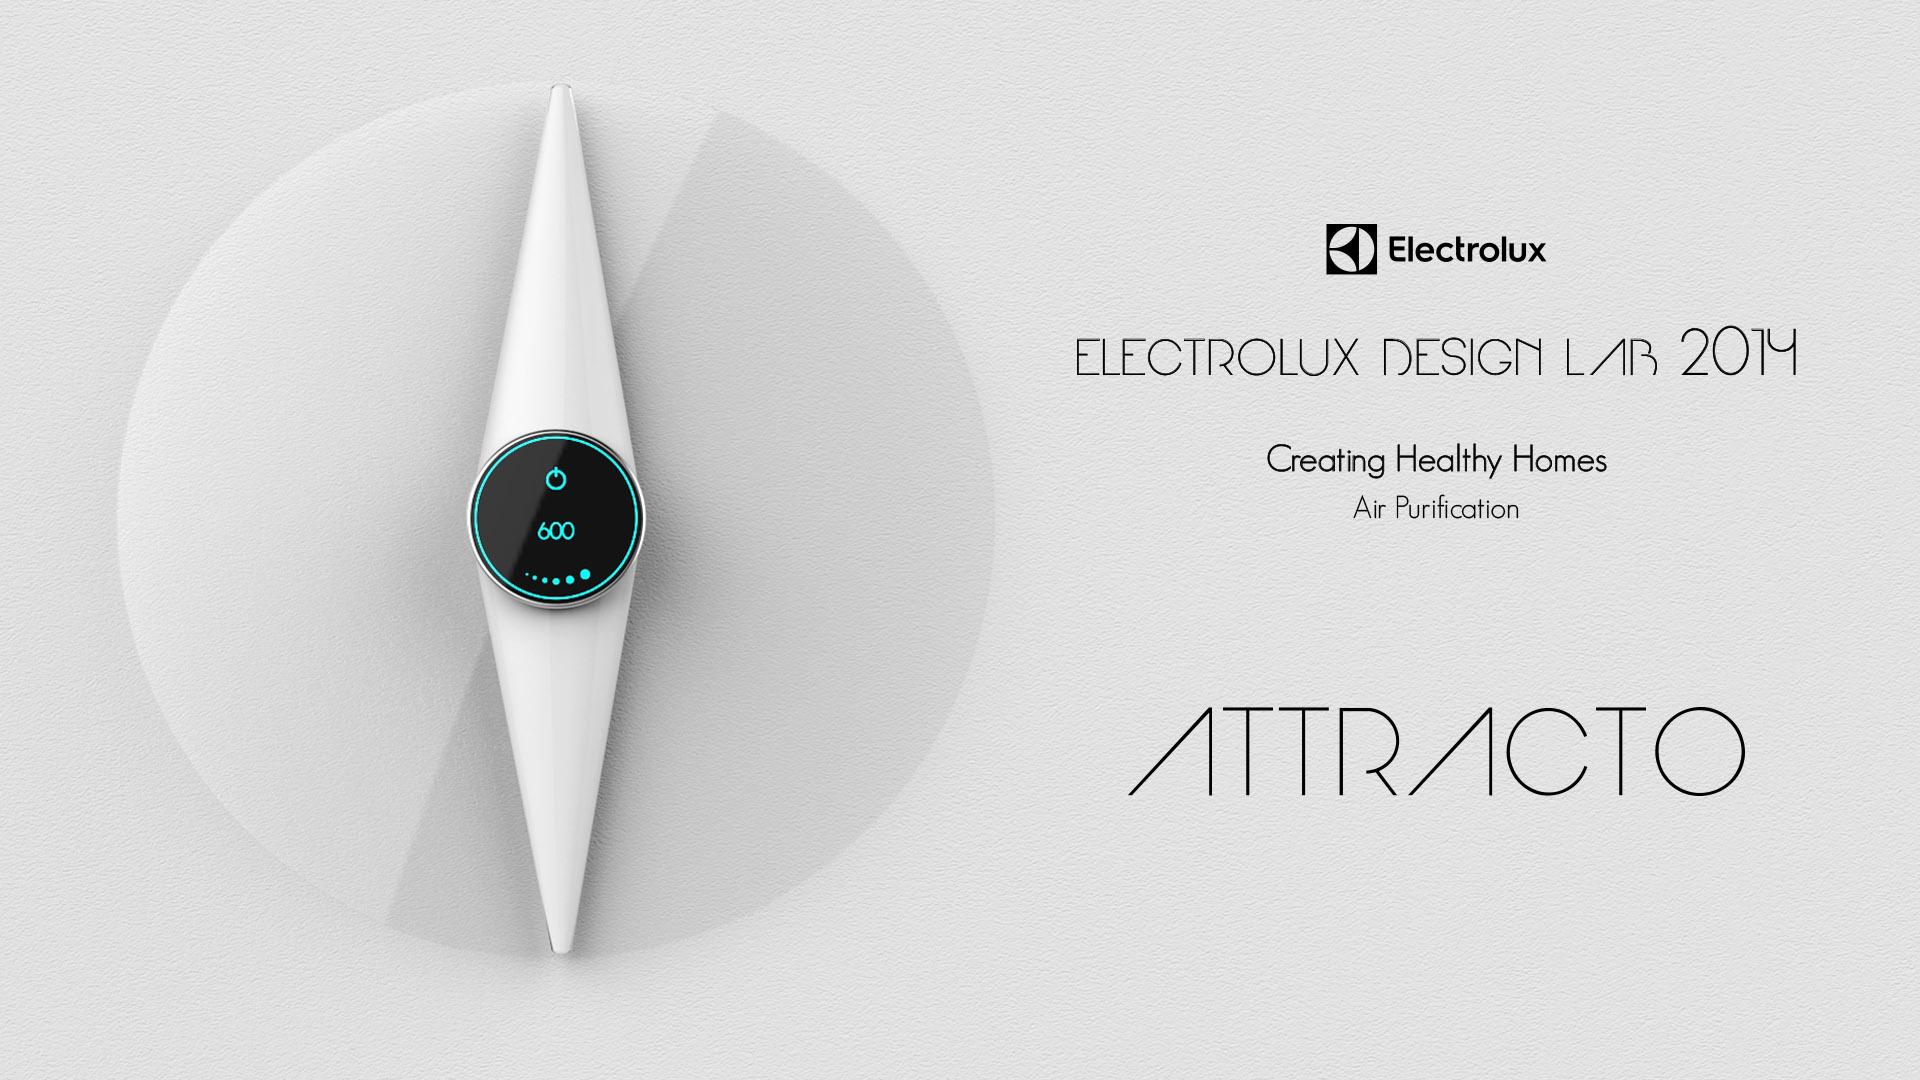 Electrolux-Design-Lab-Attracto2.jpg